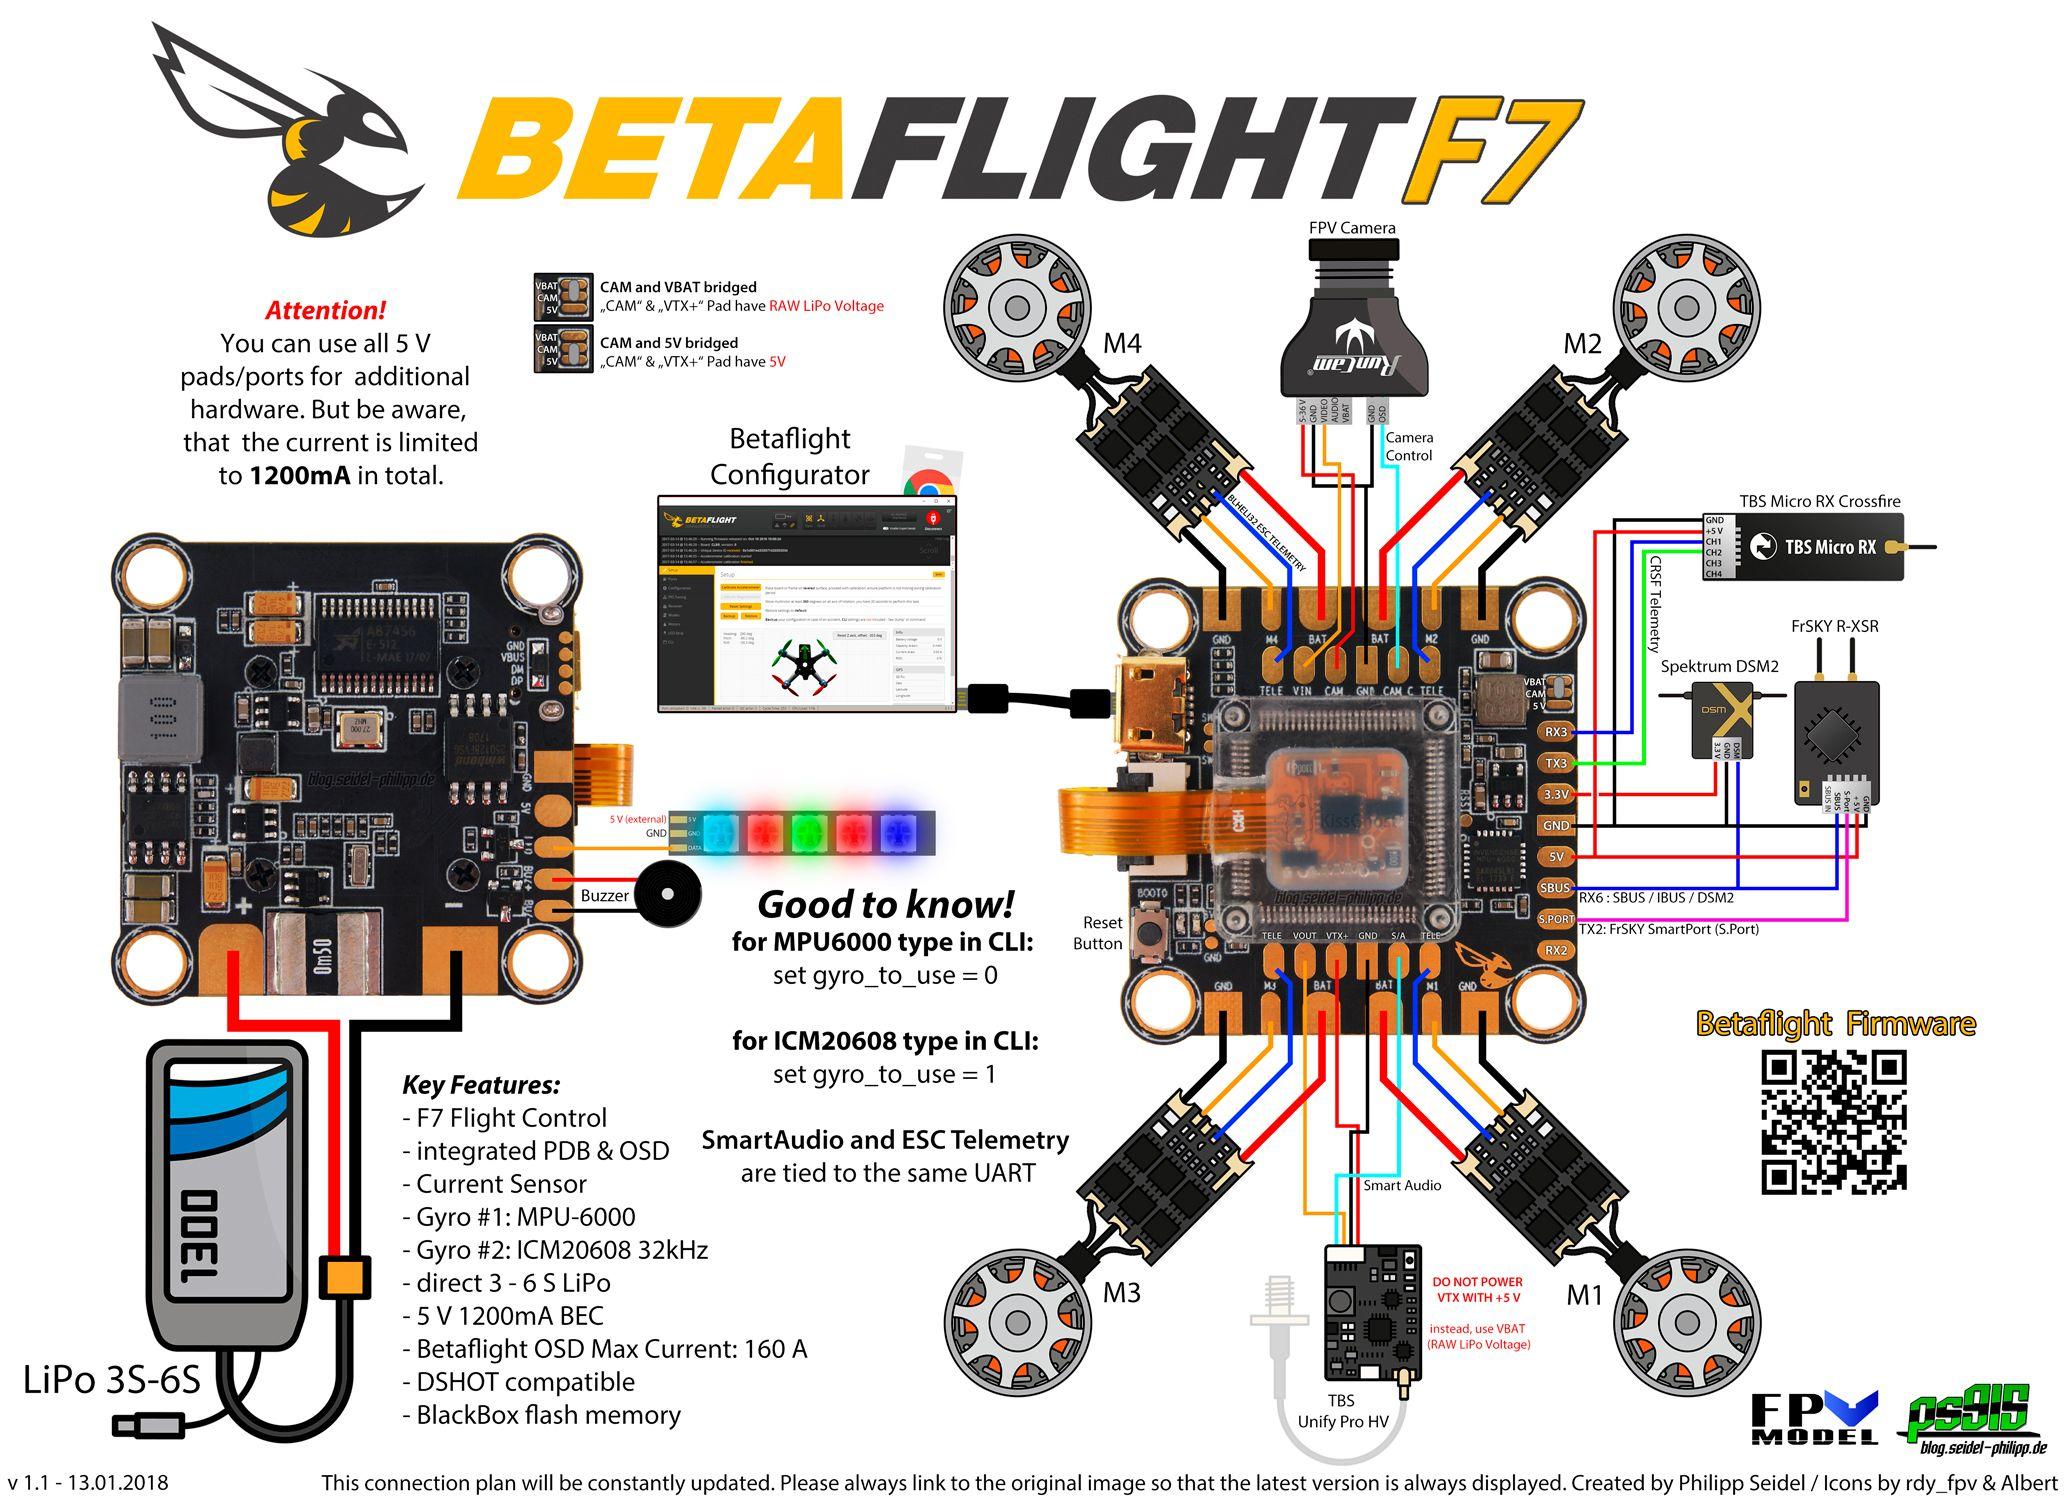 es buena controladora la betaflight f7?